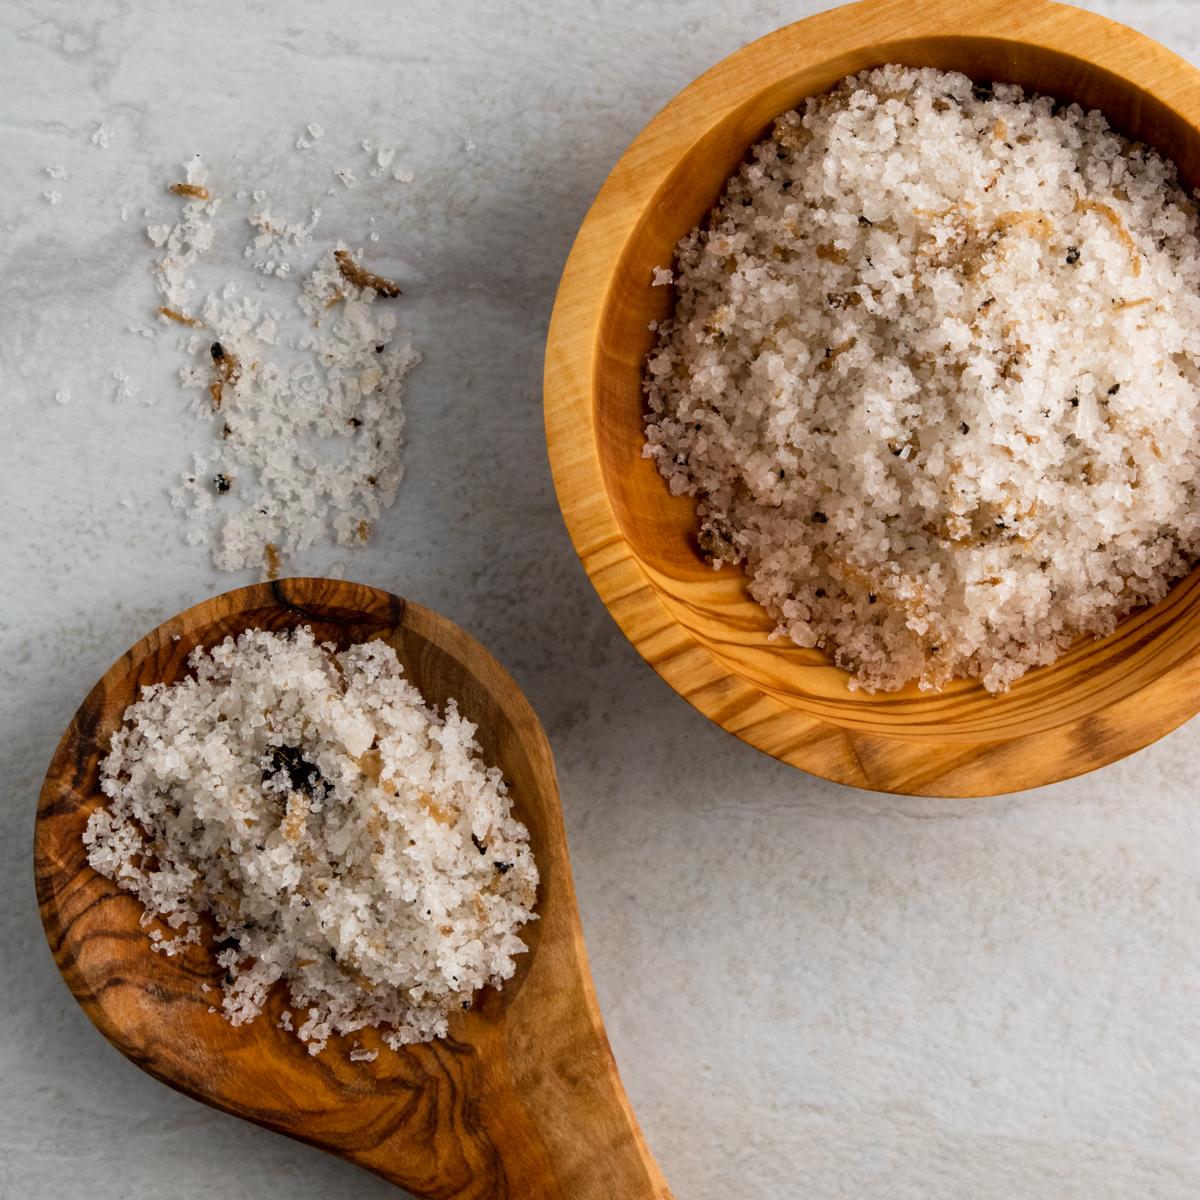 truffle salt product photography